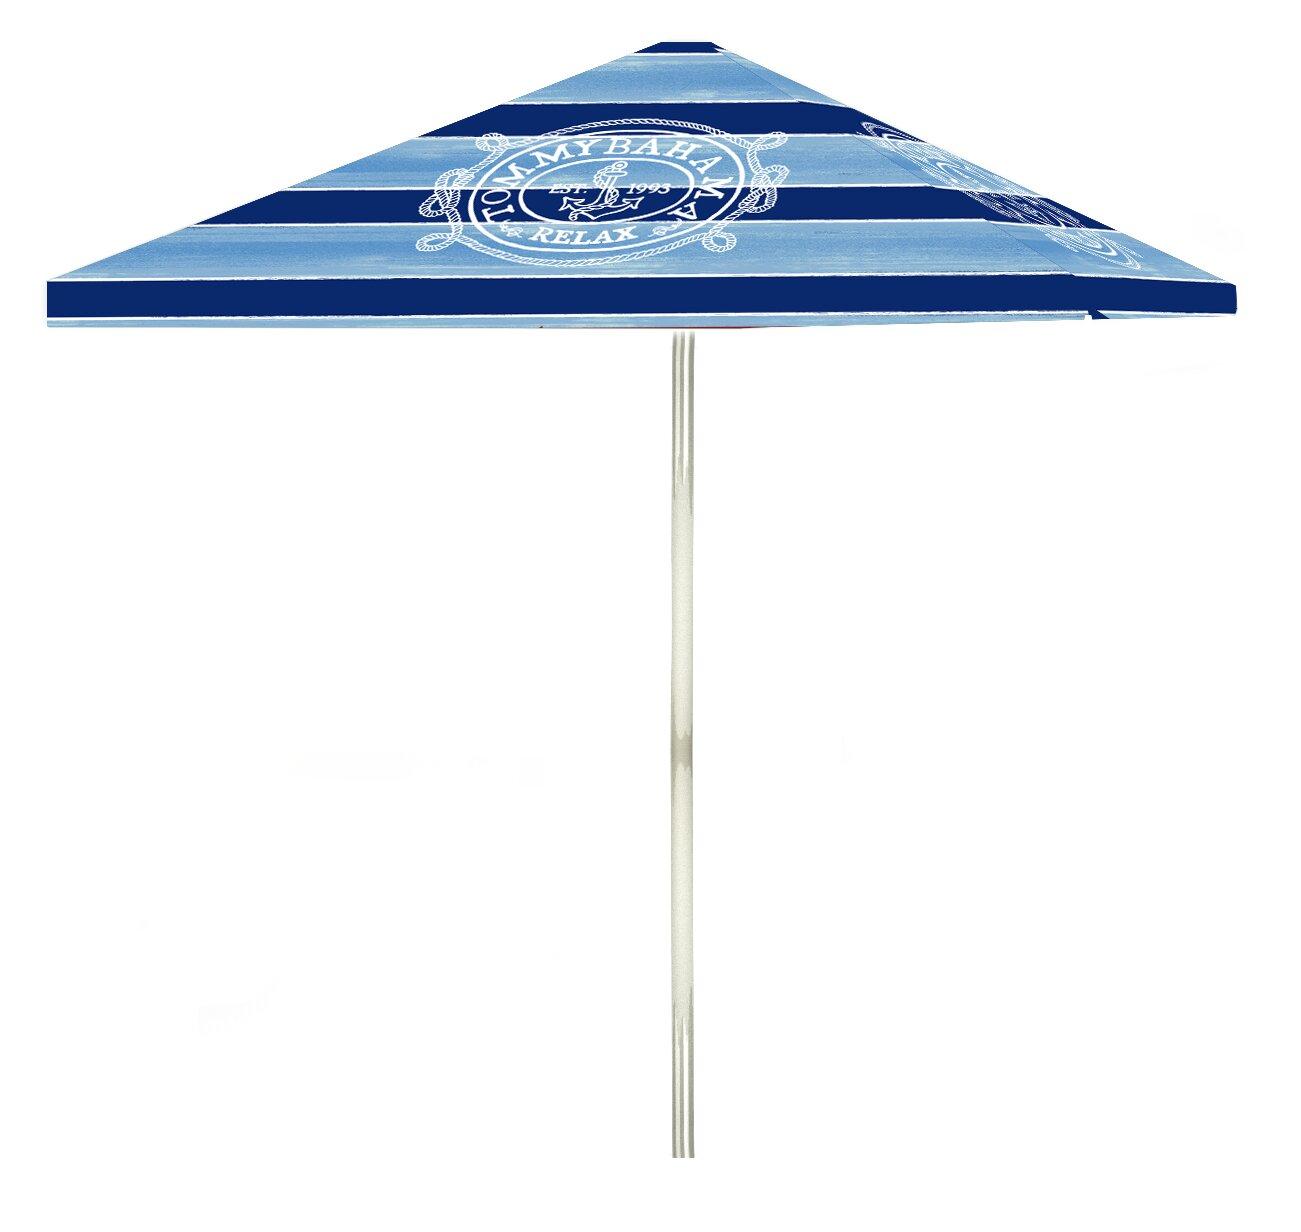 Best Of Times Tommy Bahama 6 Square Market Umbrella Wayfair